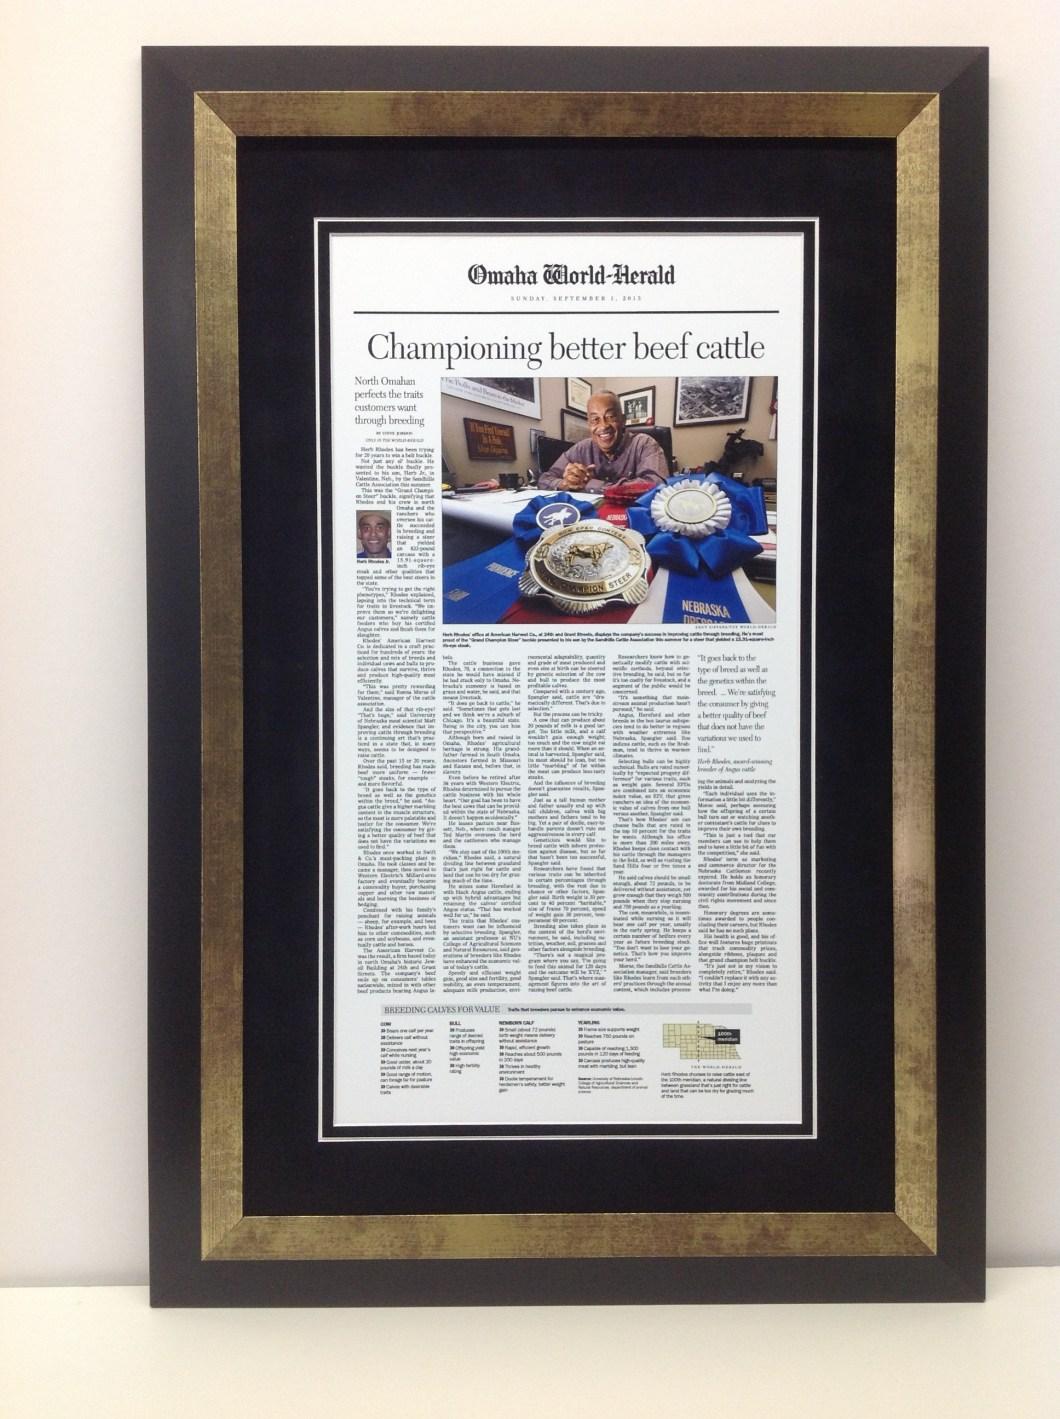 How Do I Frame A Newspaper Article | Siteframes.co